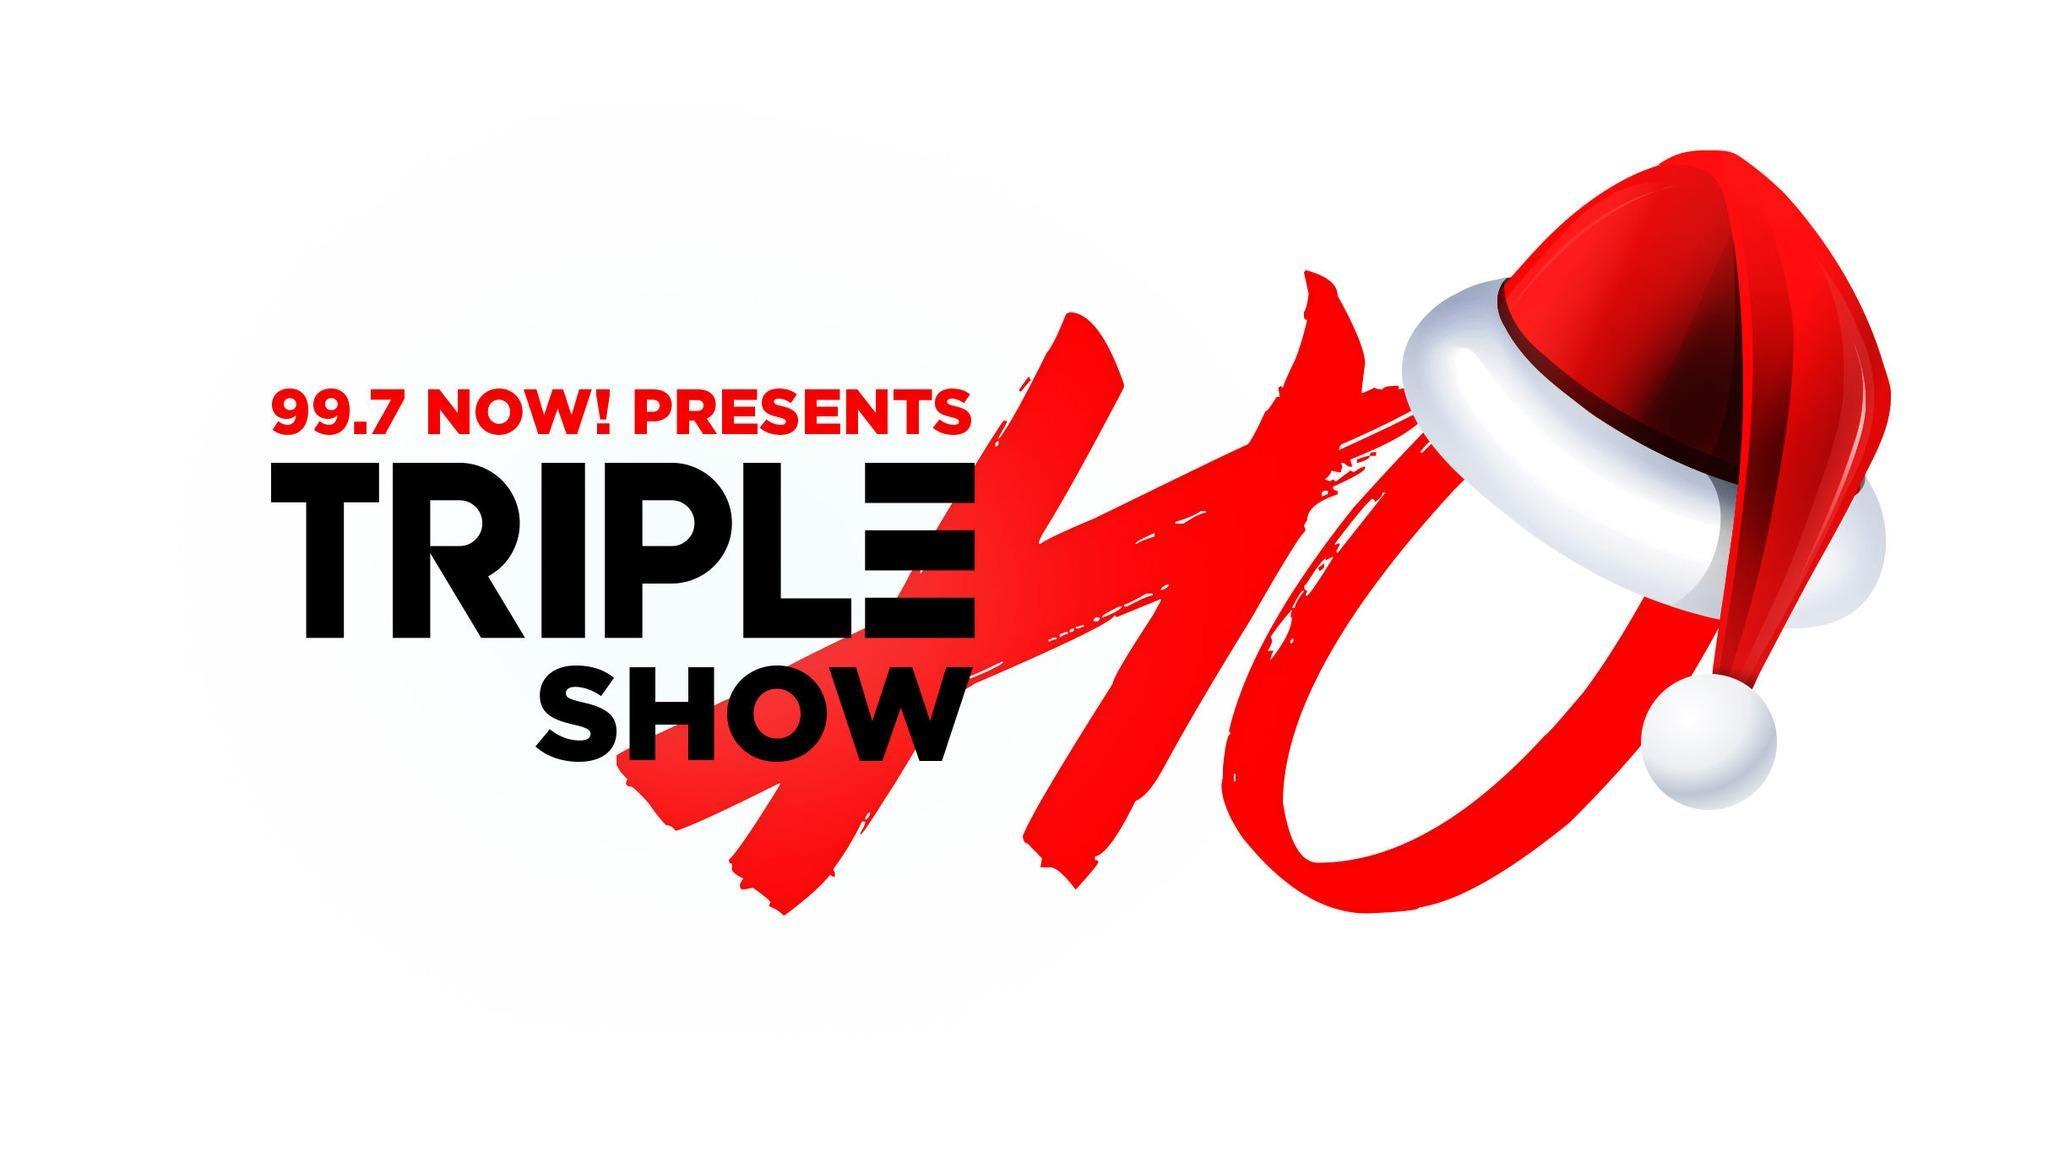 99.7 Now! Presents Triple Ho Show 7.0 - San Jose, CA 95113